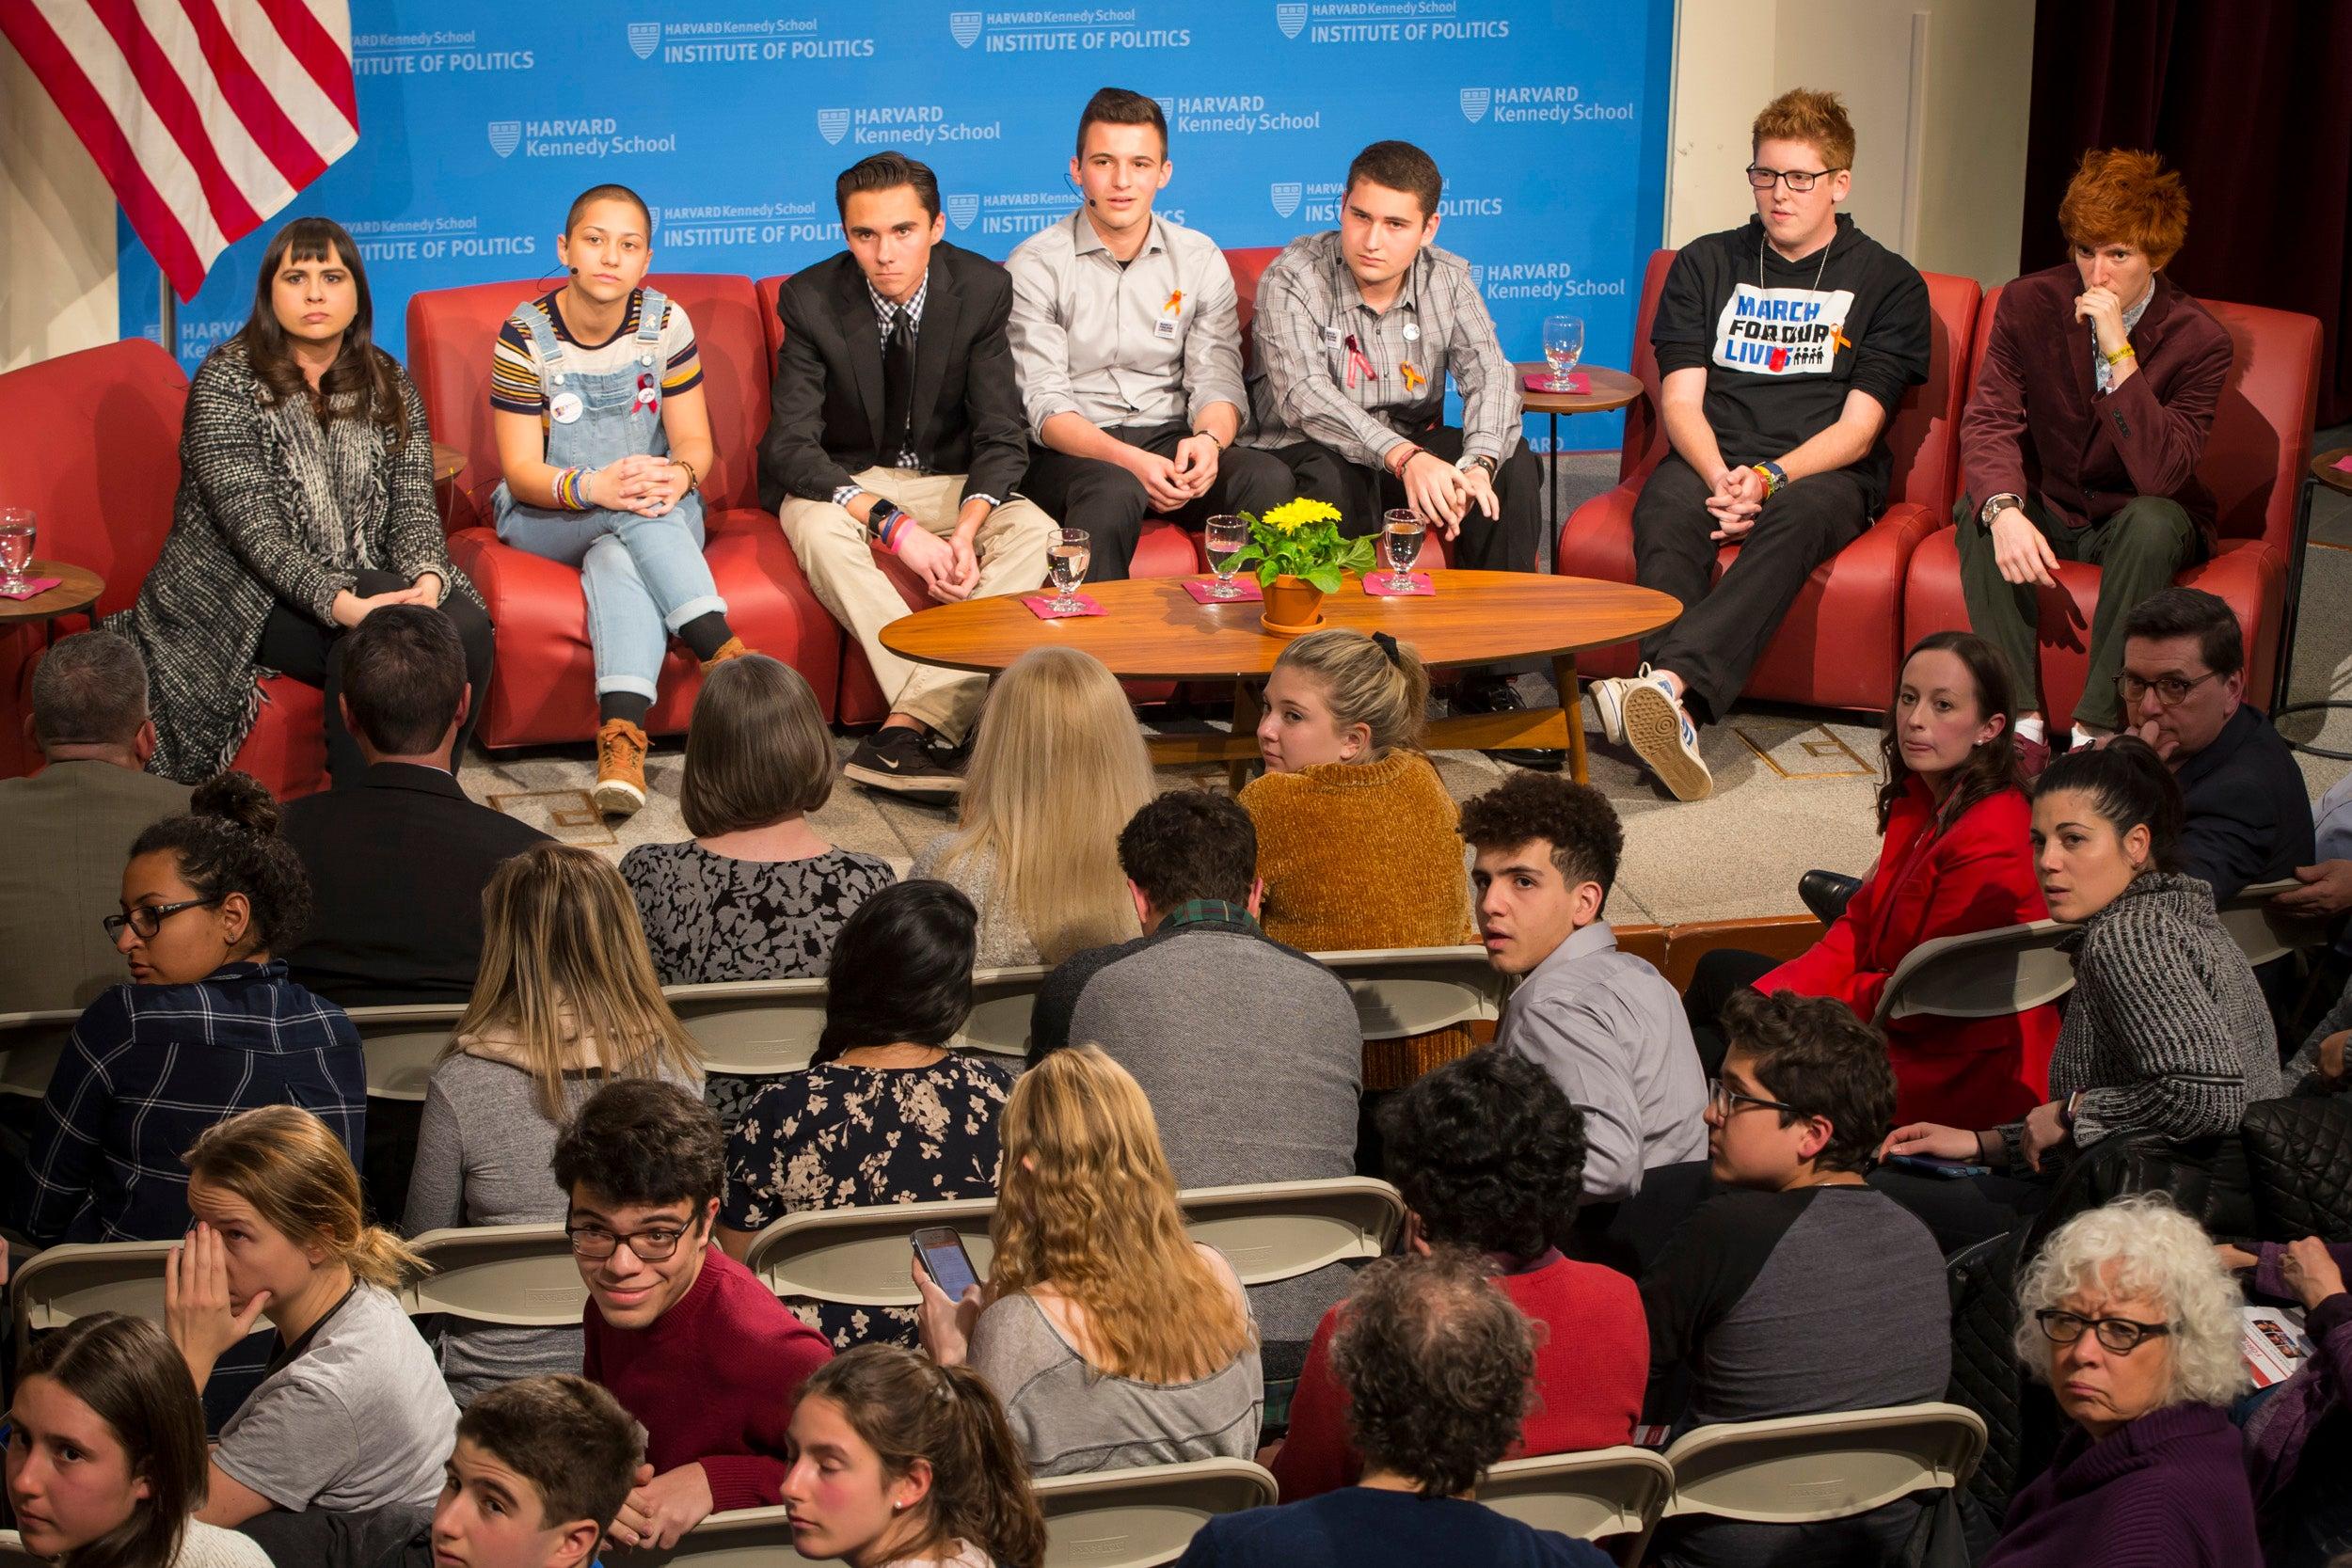 Meighan Stone, Emma Gonzalez, David Hogg, Cameron Kasky, Alex Wind, Matt Deitsch, and Ryan Deitsch.